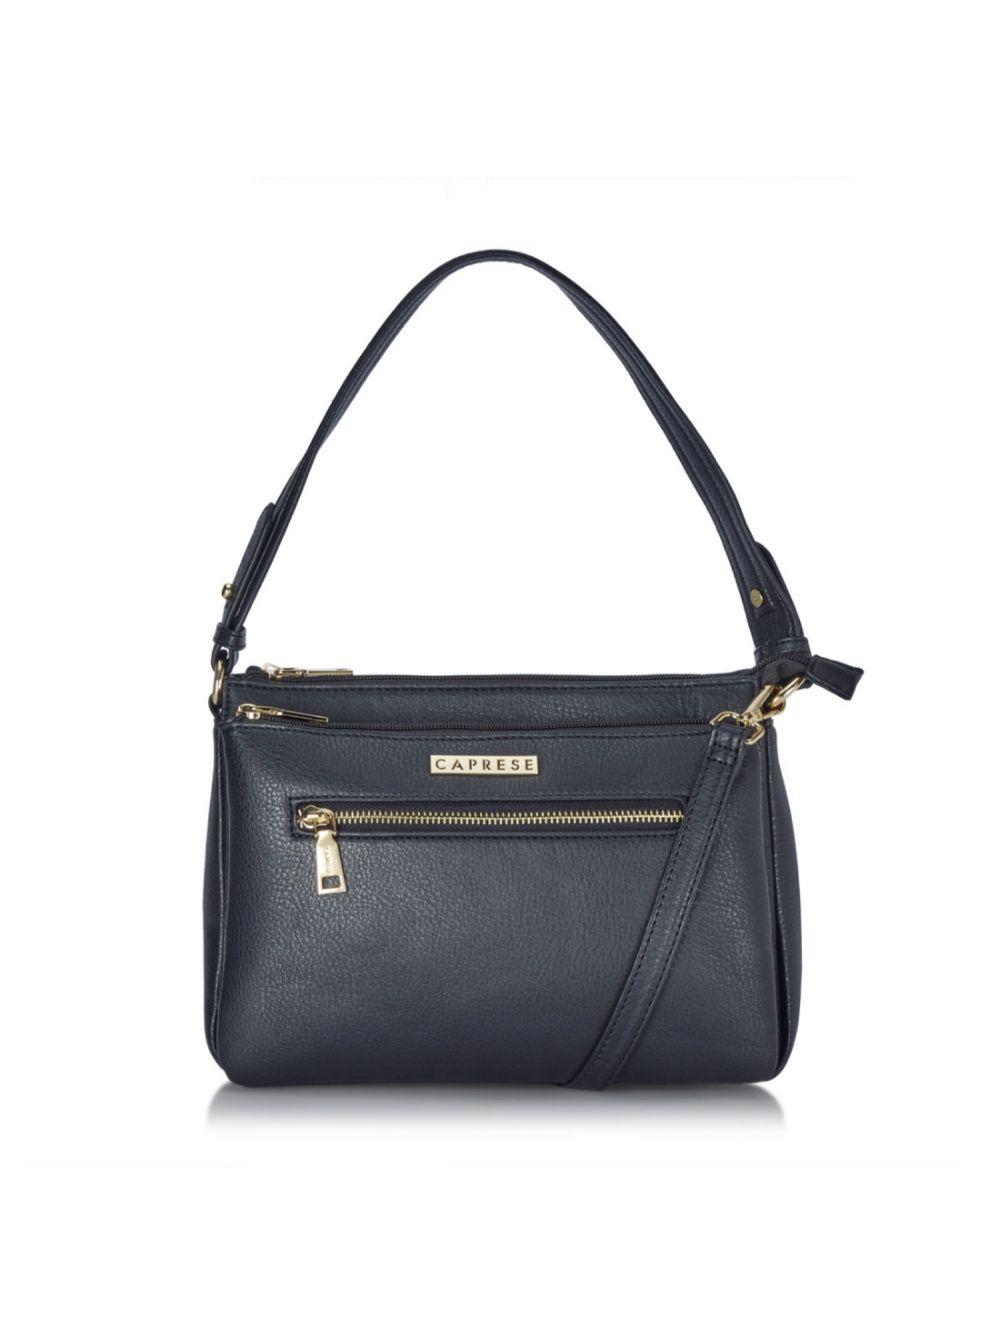 3f043c18d Caprese Sling   Cross Bags   Buy Caprese Tracee Large (E) Black ...